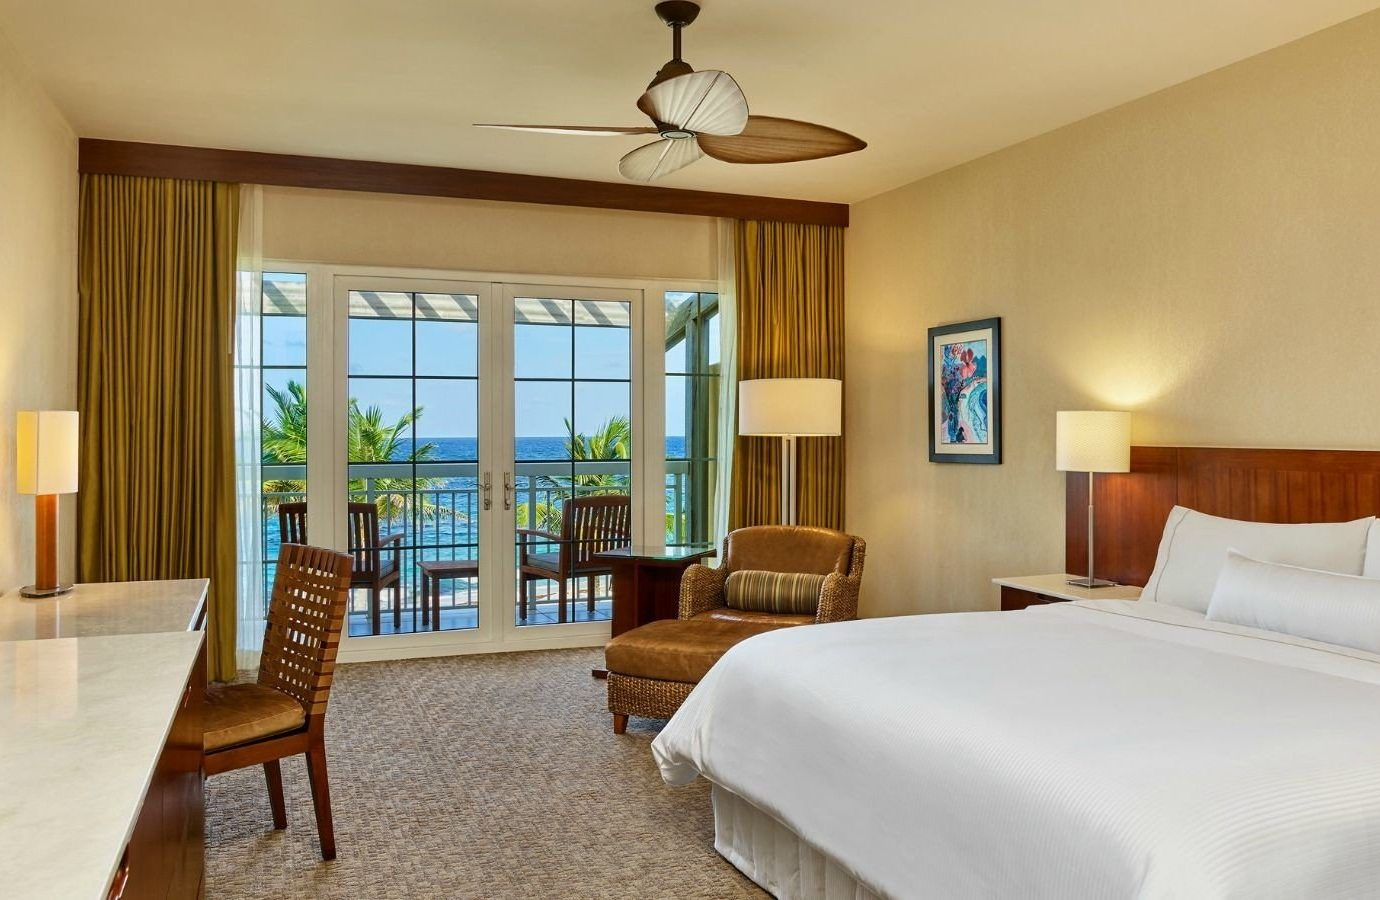 Hotels indoor wall bed floor room hotel ceiling property Suite real estate Bedroom interior design estate Resort window furniture